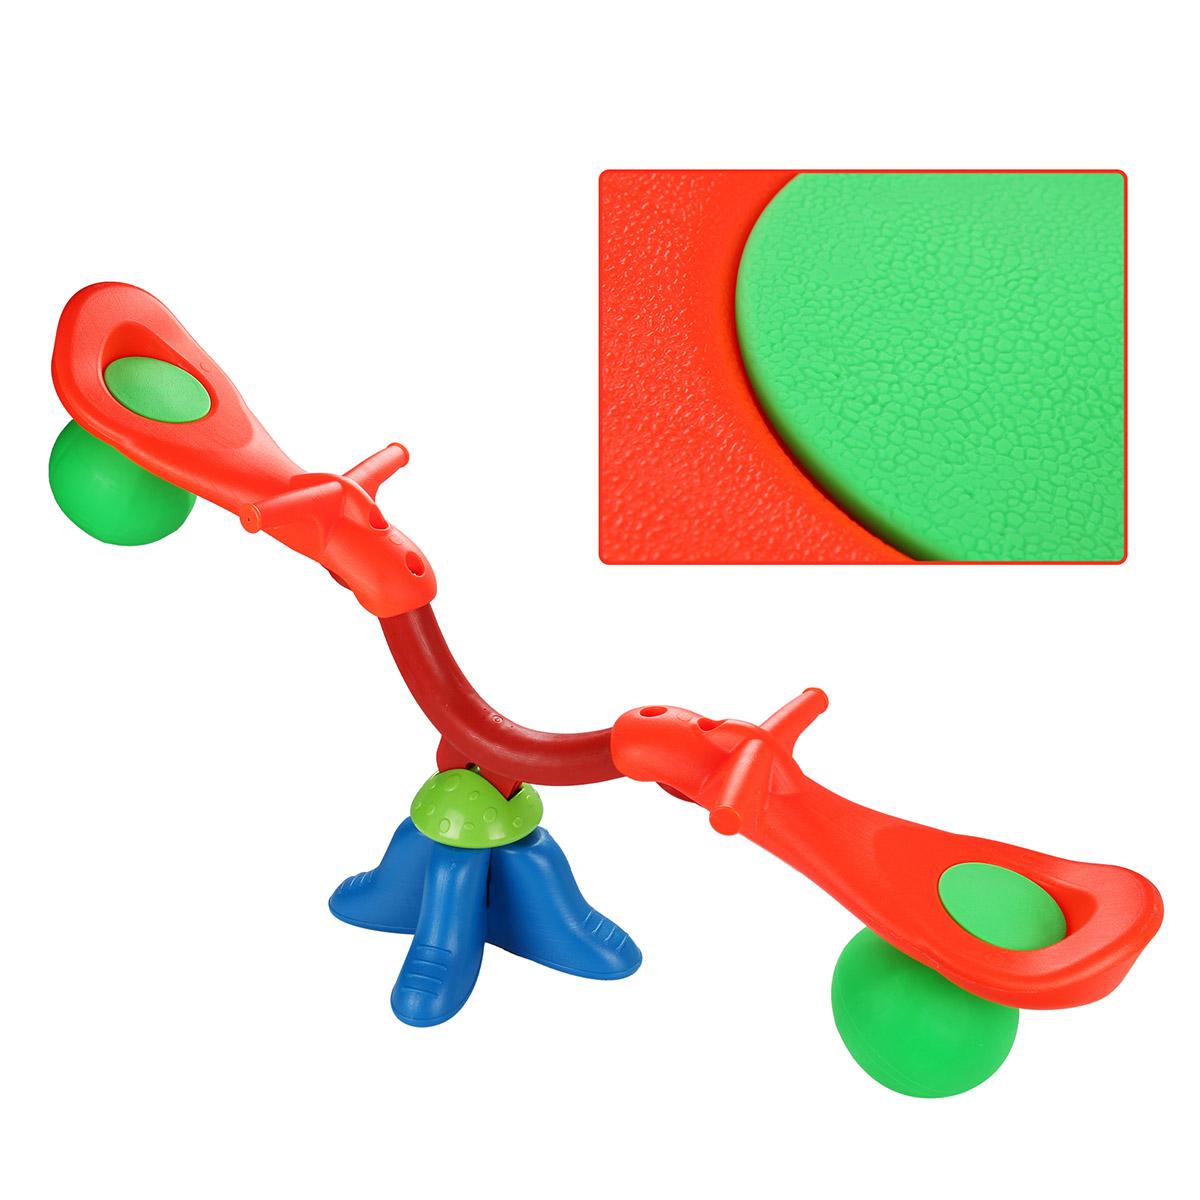 Kids Seesaw 360 Degree Spinning Teeter